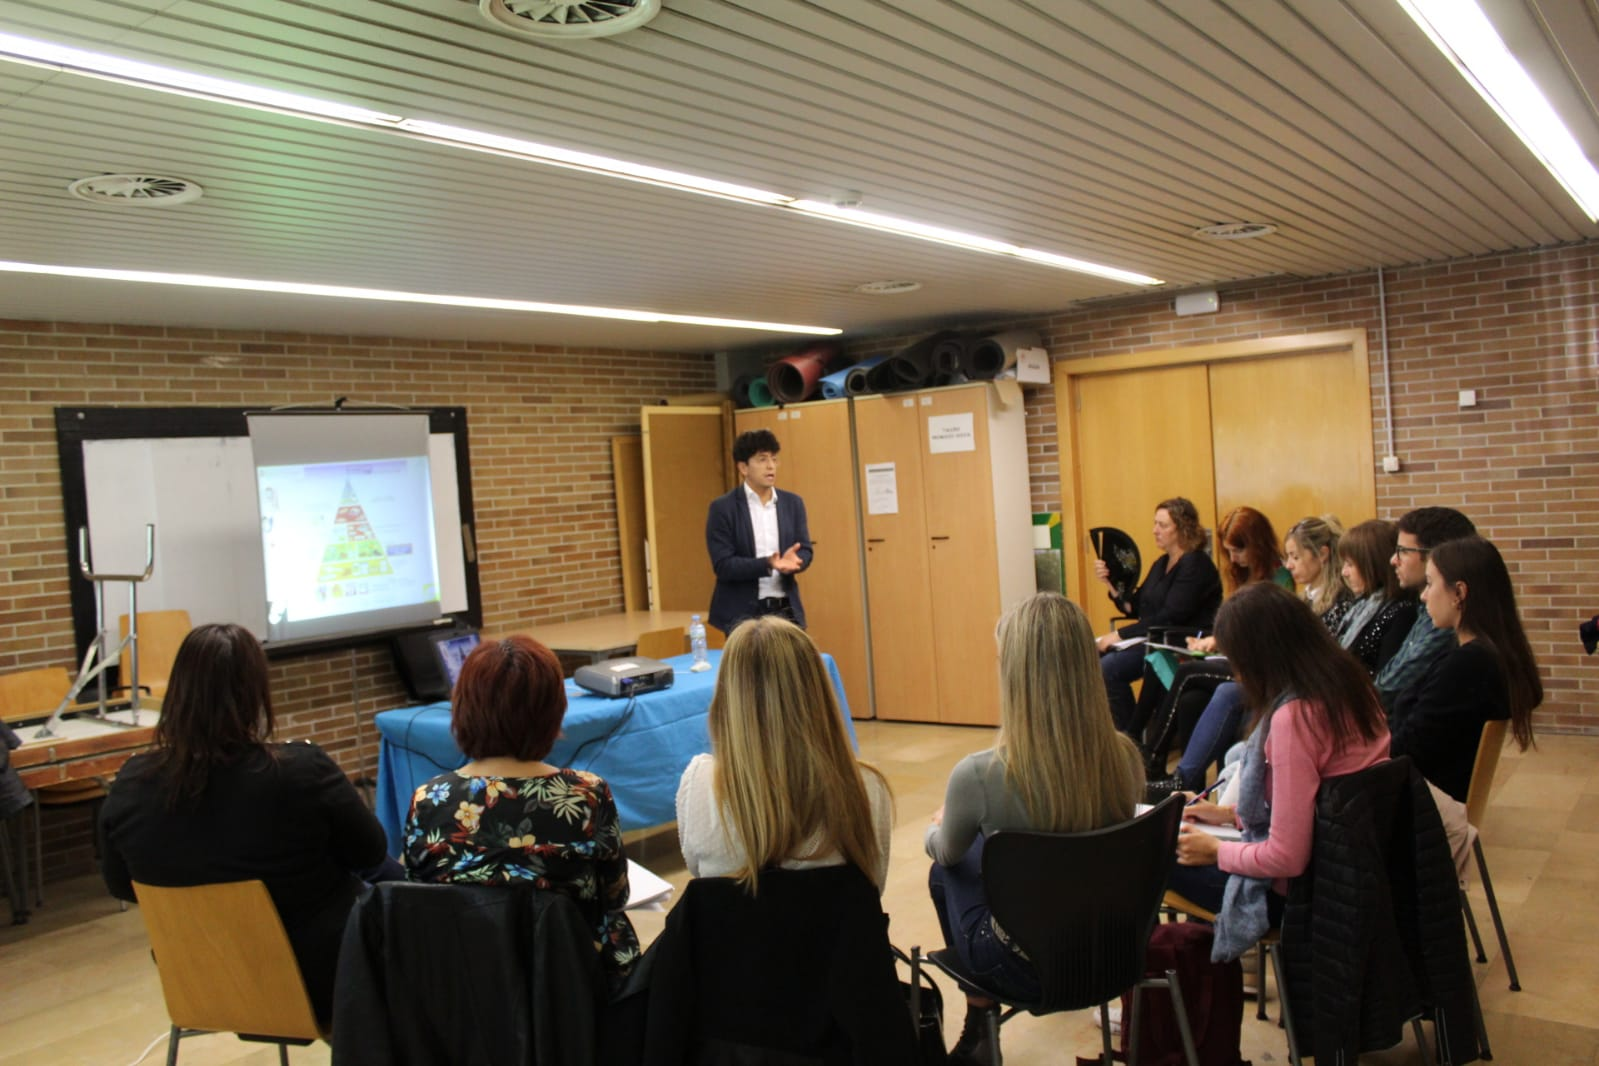 ADC Lleida, formació de diabetis i escola, grup de treball.